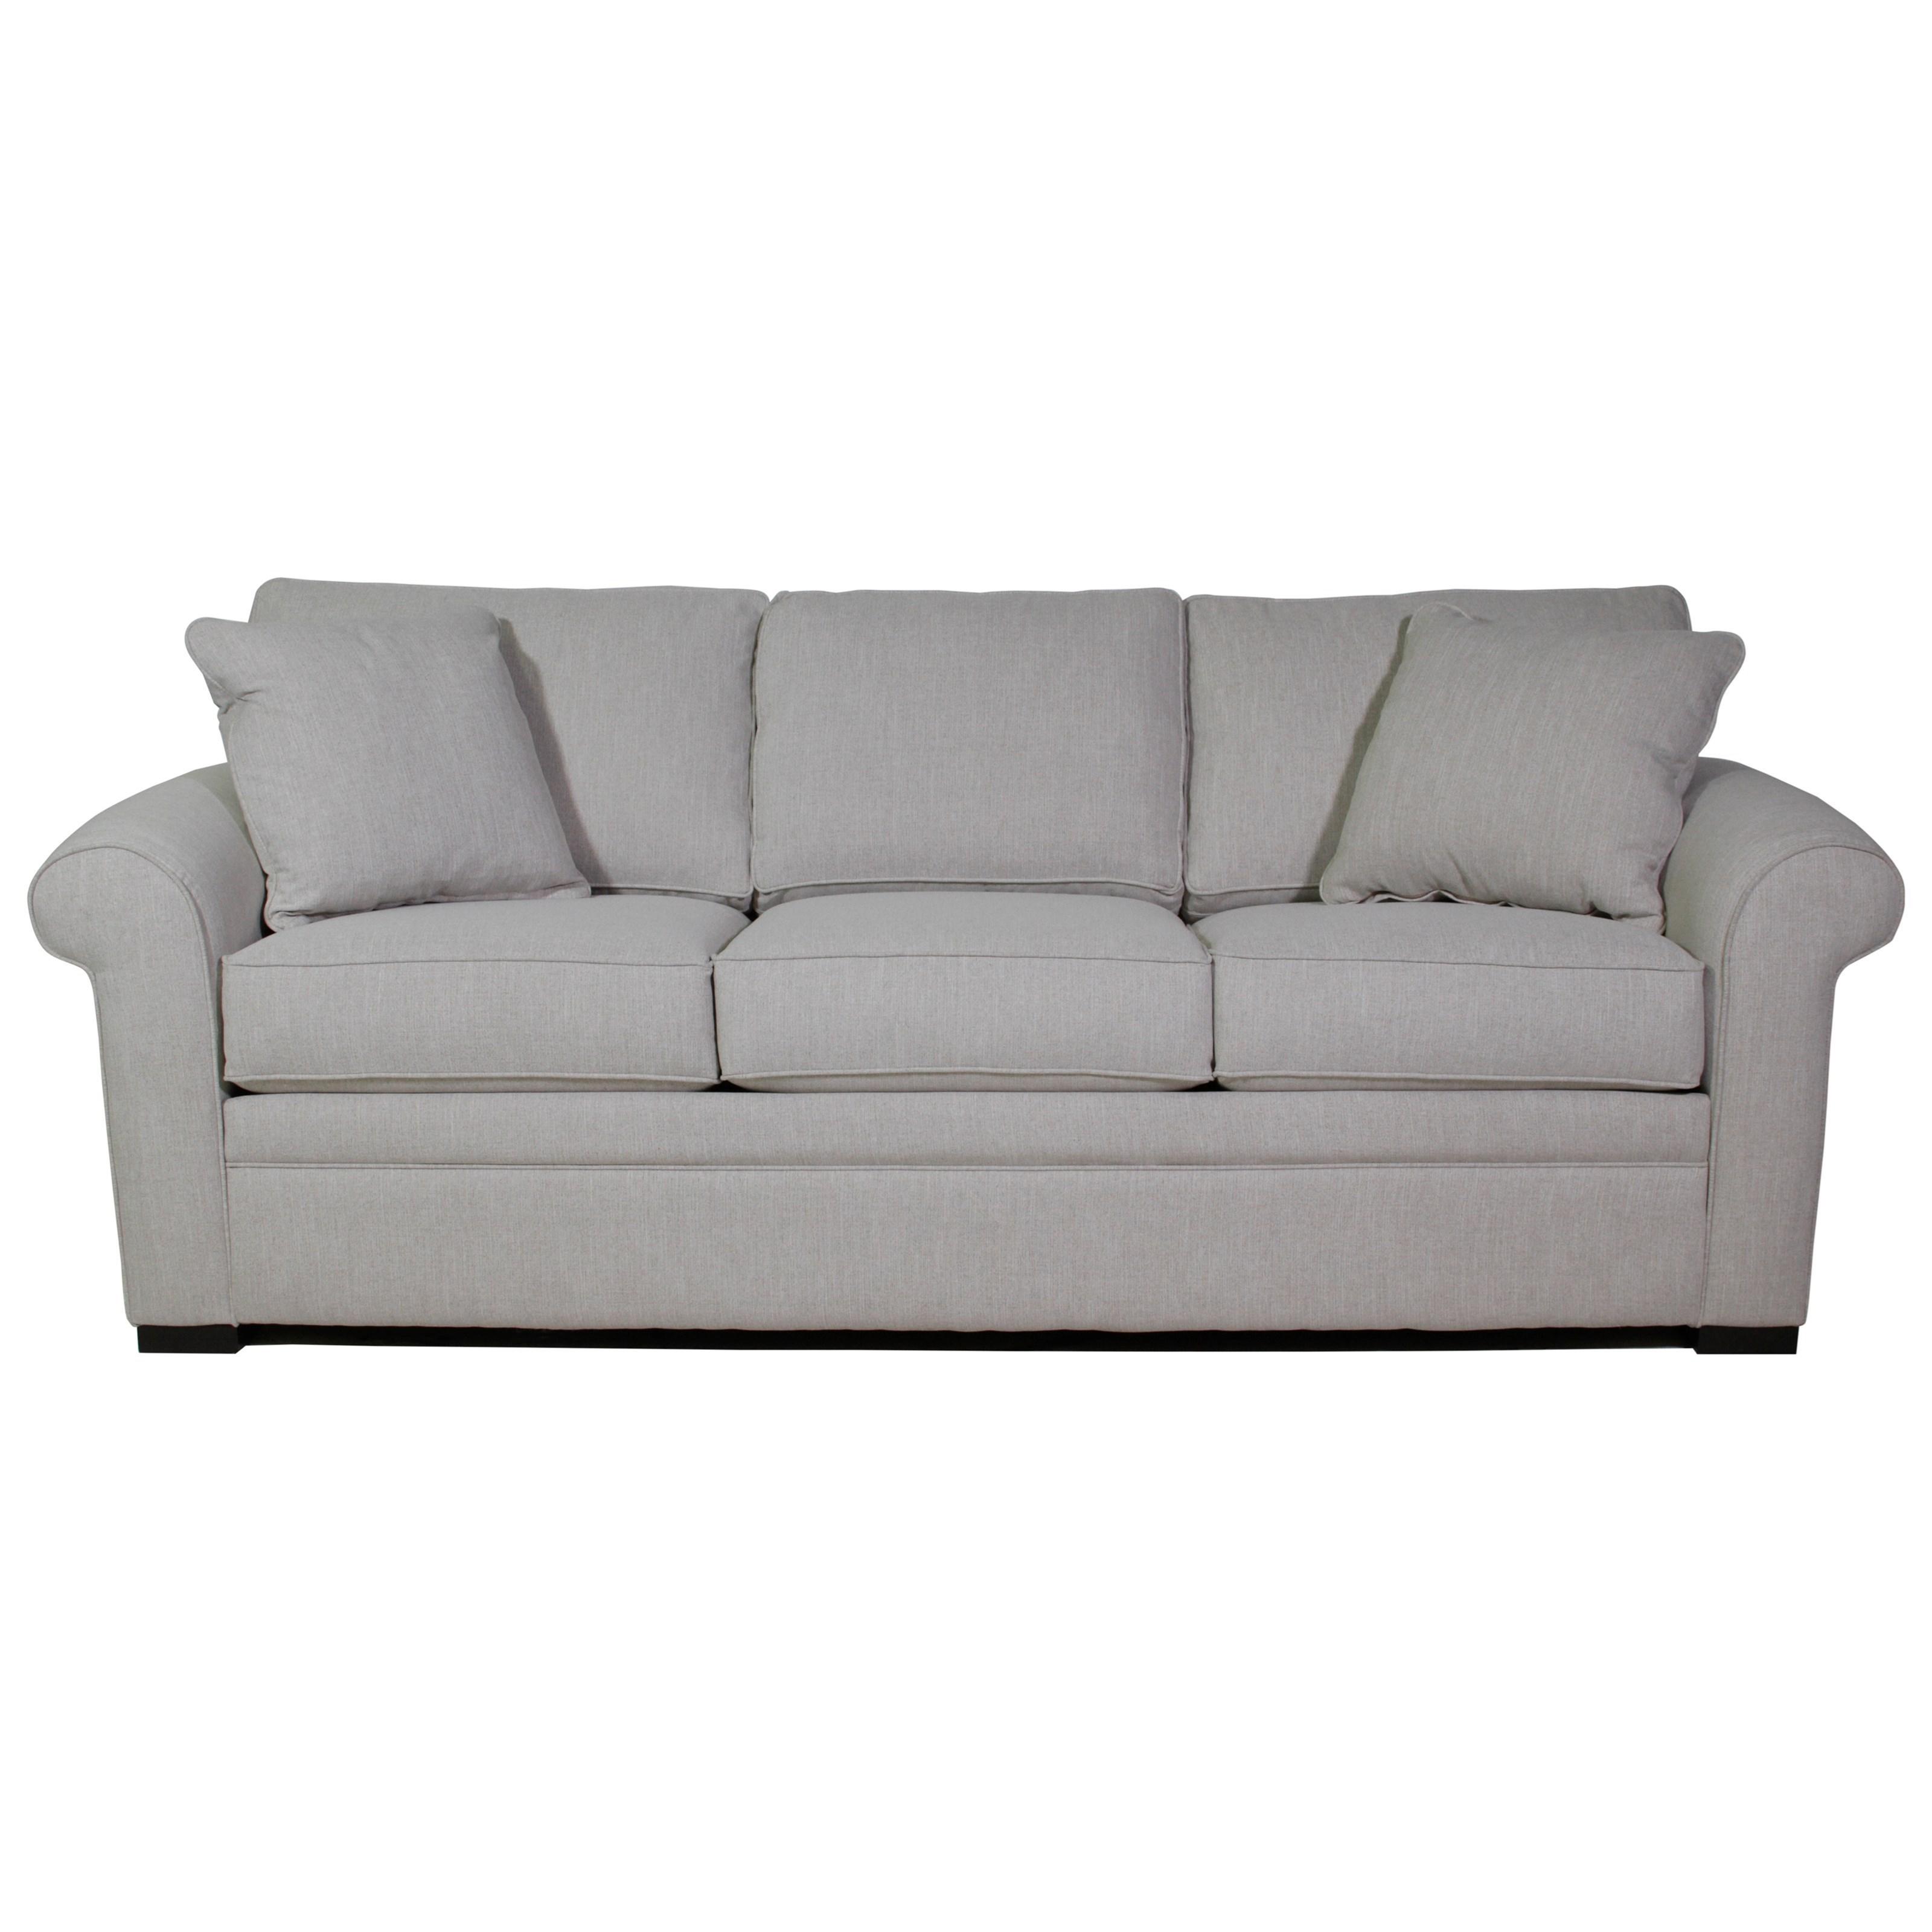 foam sofa sleeper fundas para sofas en leon jonathan louis dozy 107 31mf transitional queen with dozyqueen memory